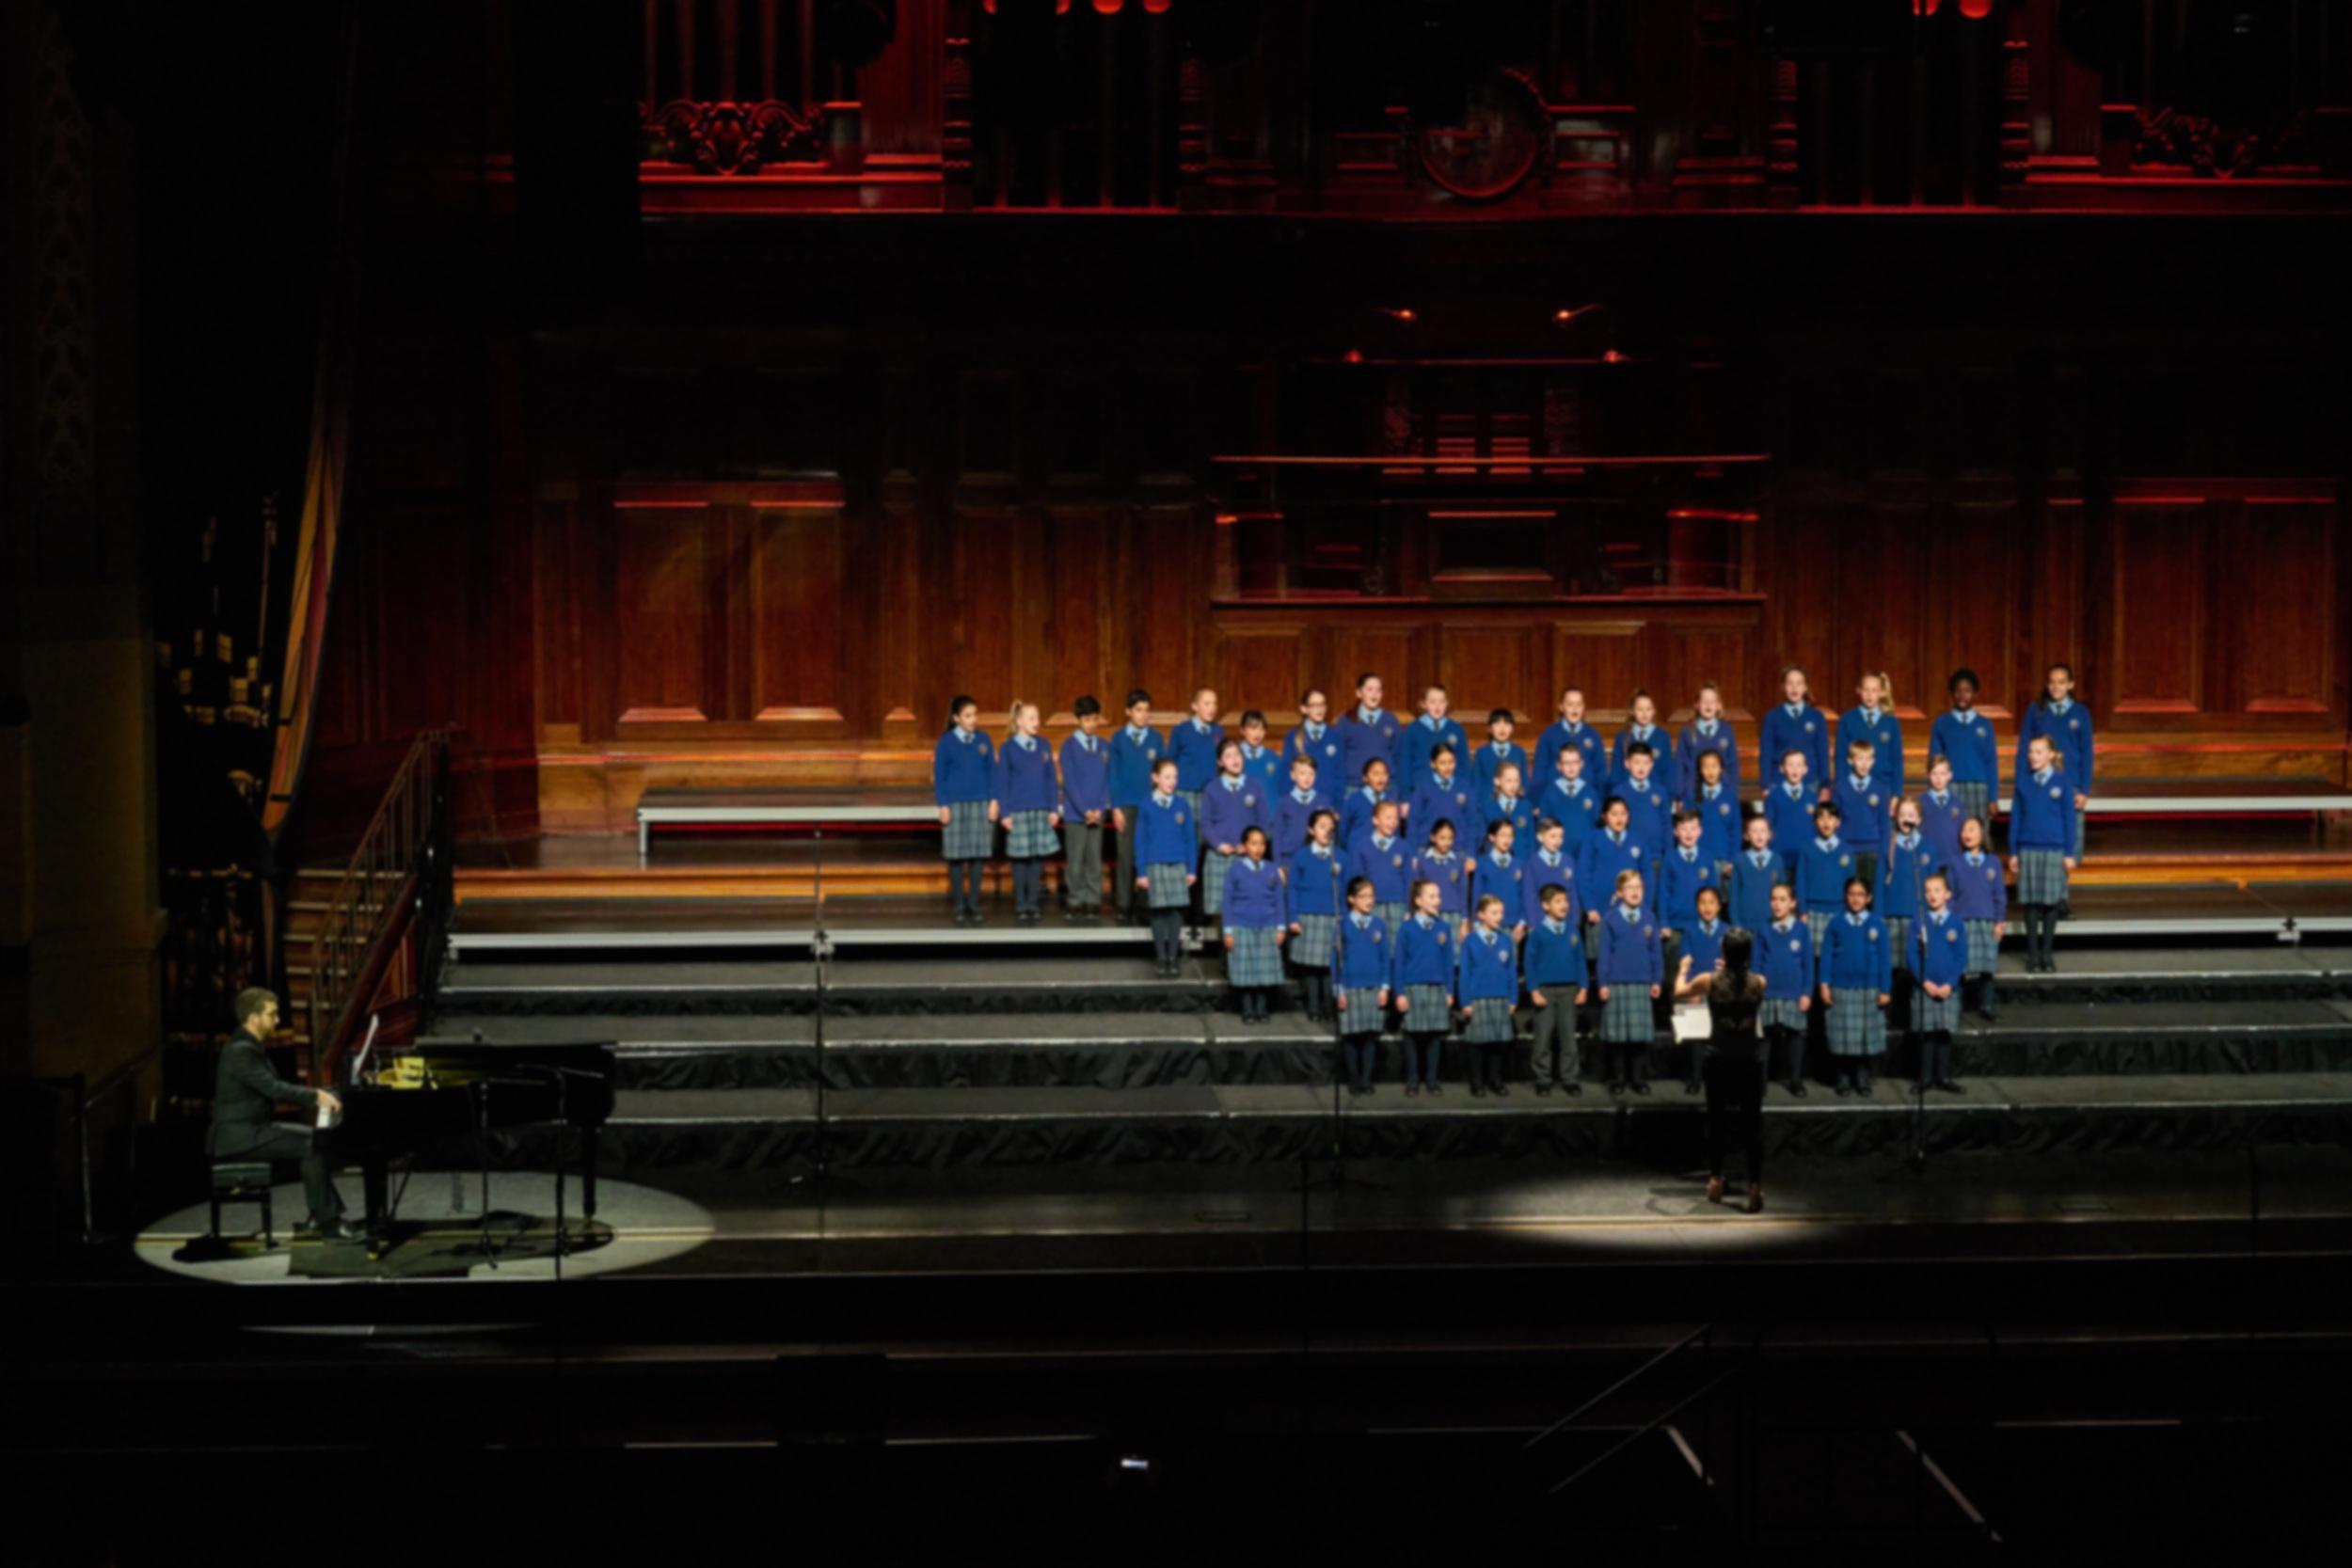 Choir03.jpg